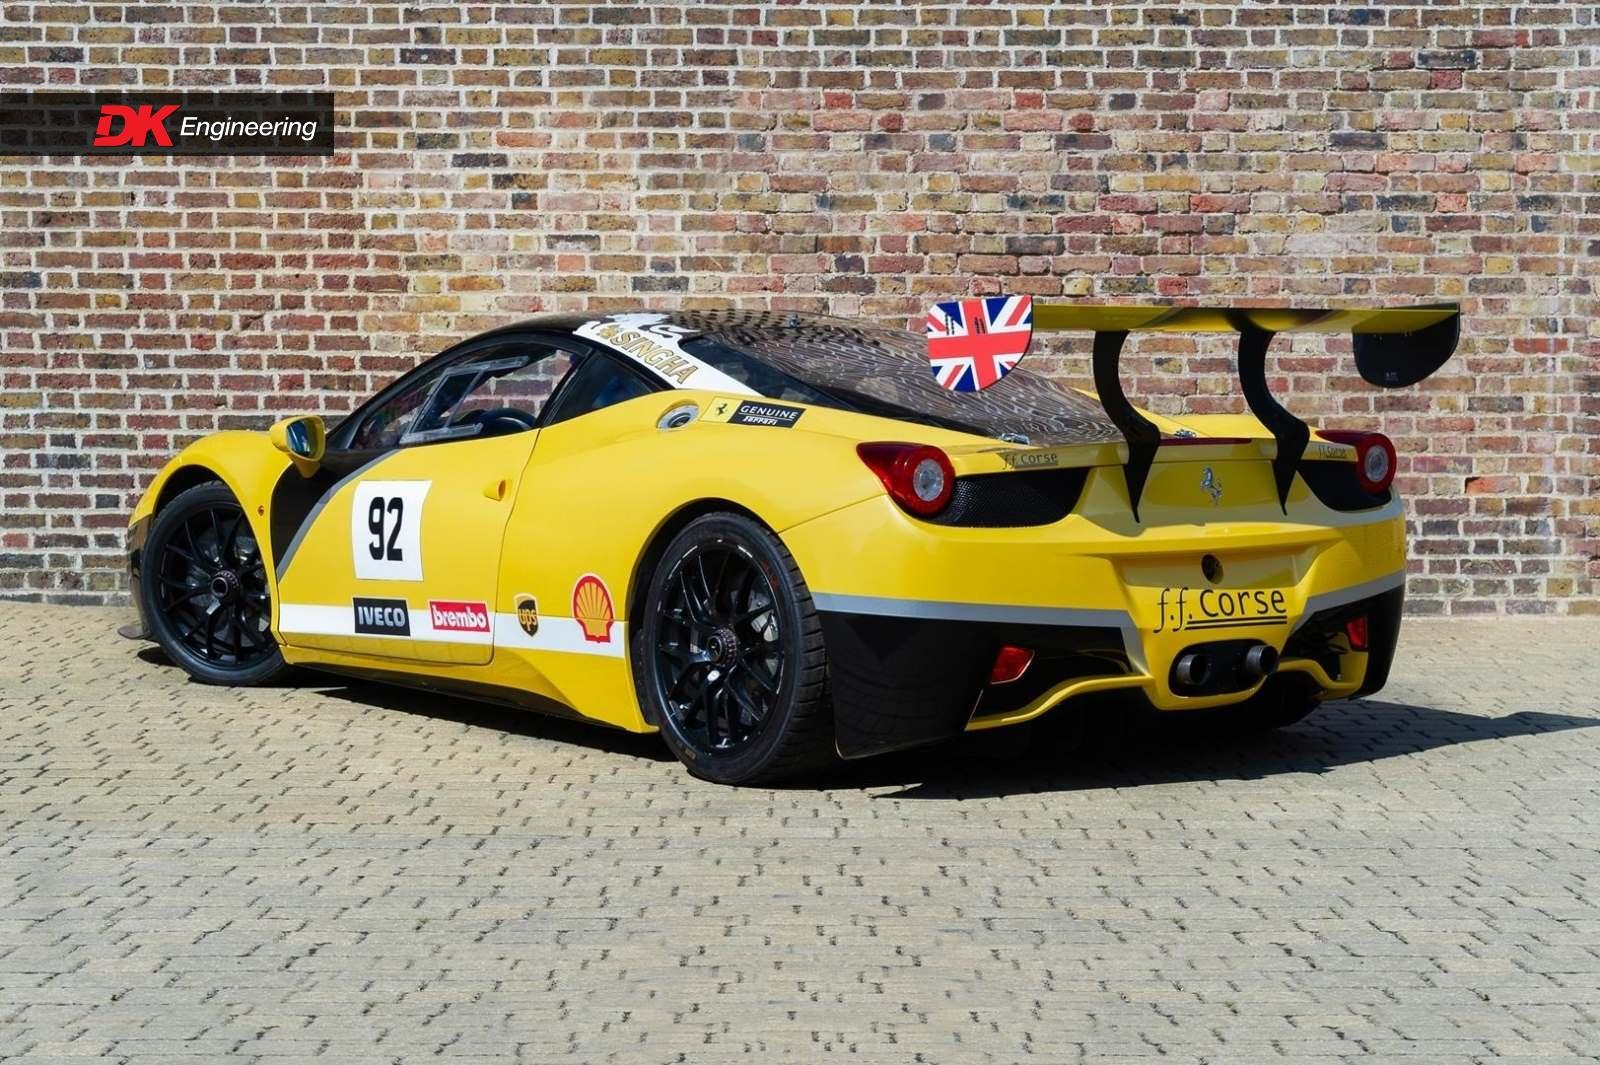 Ferrari 458 Challenge Evo For Sale Vehicle Sales Dk Engineering